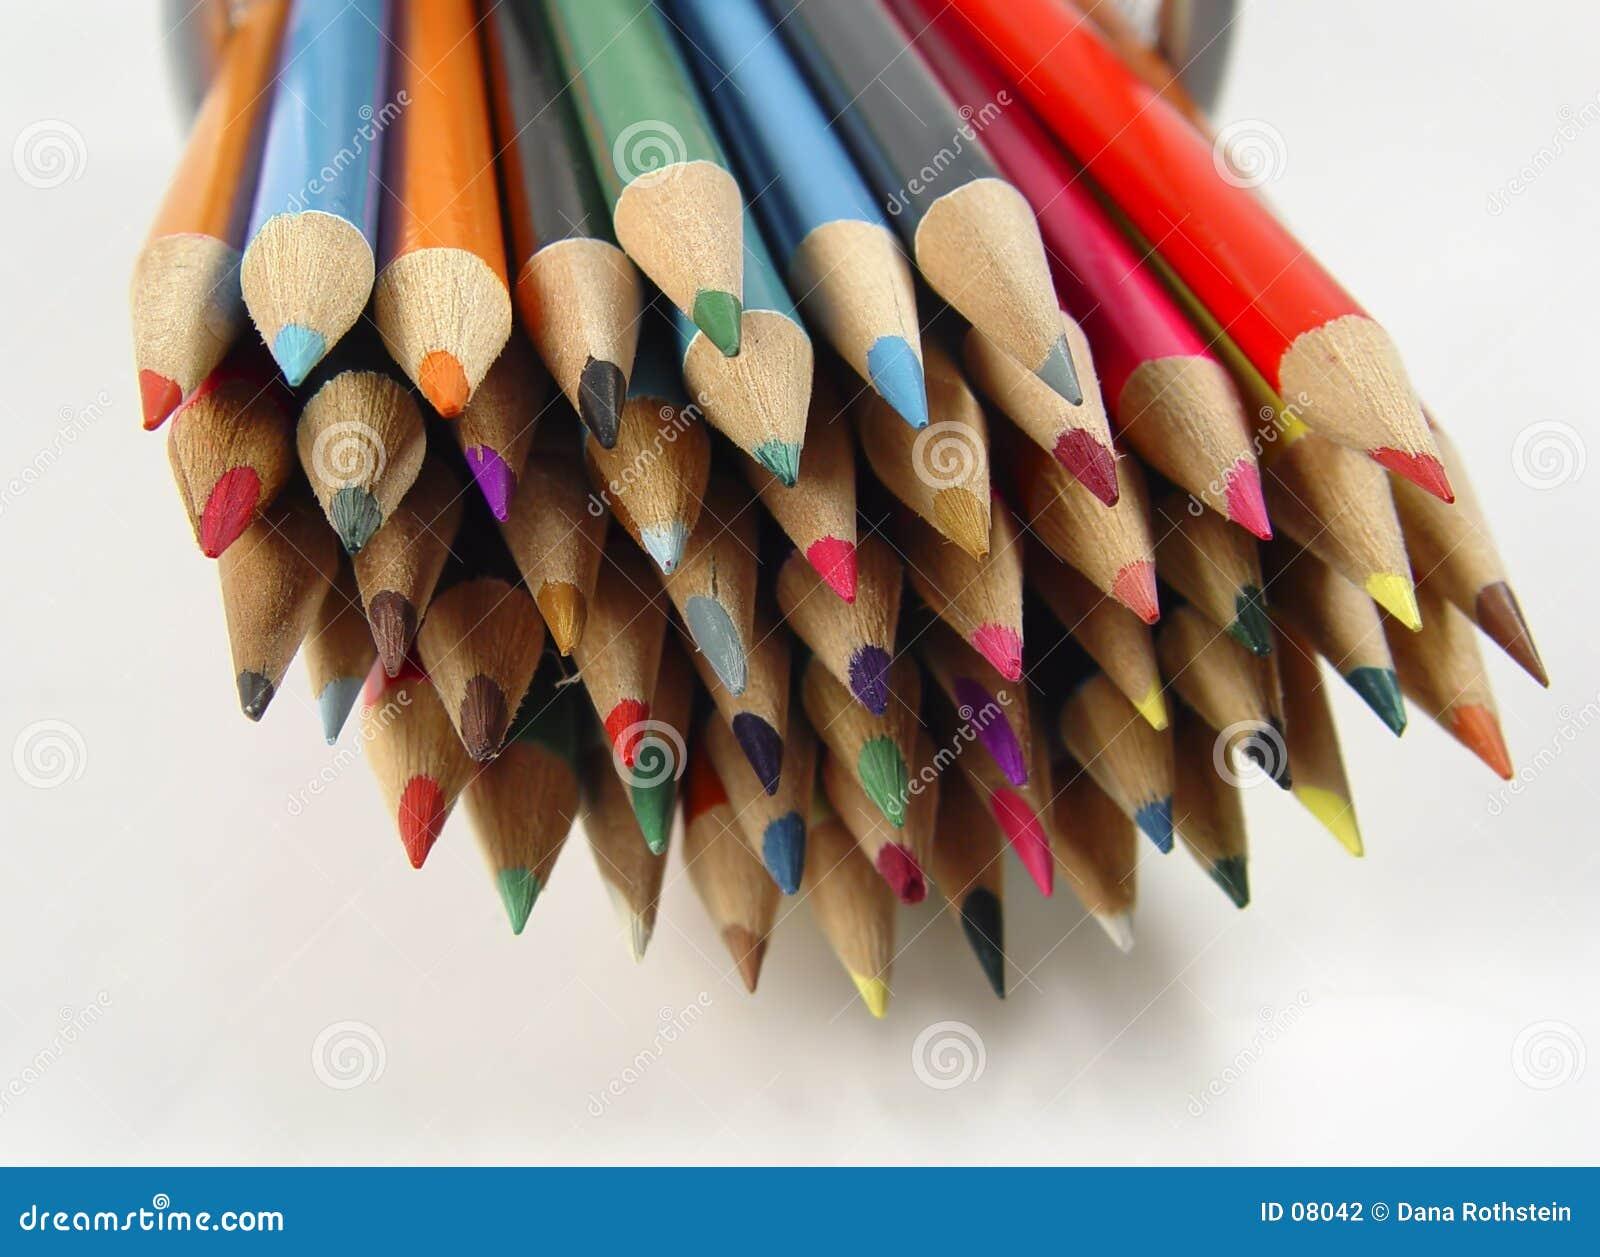 7 покрашенных карандашей